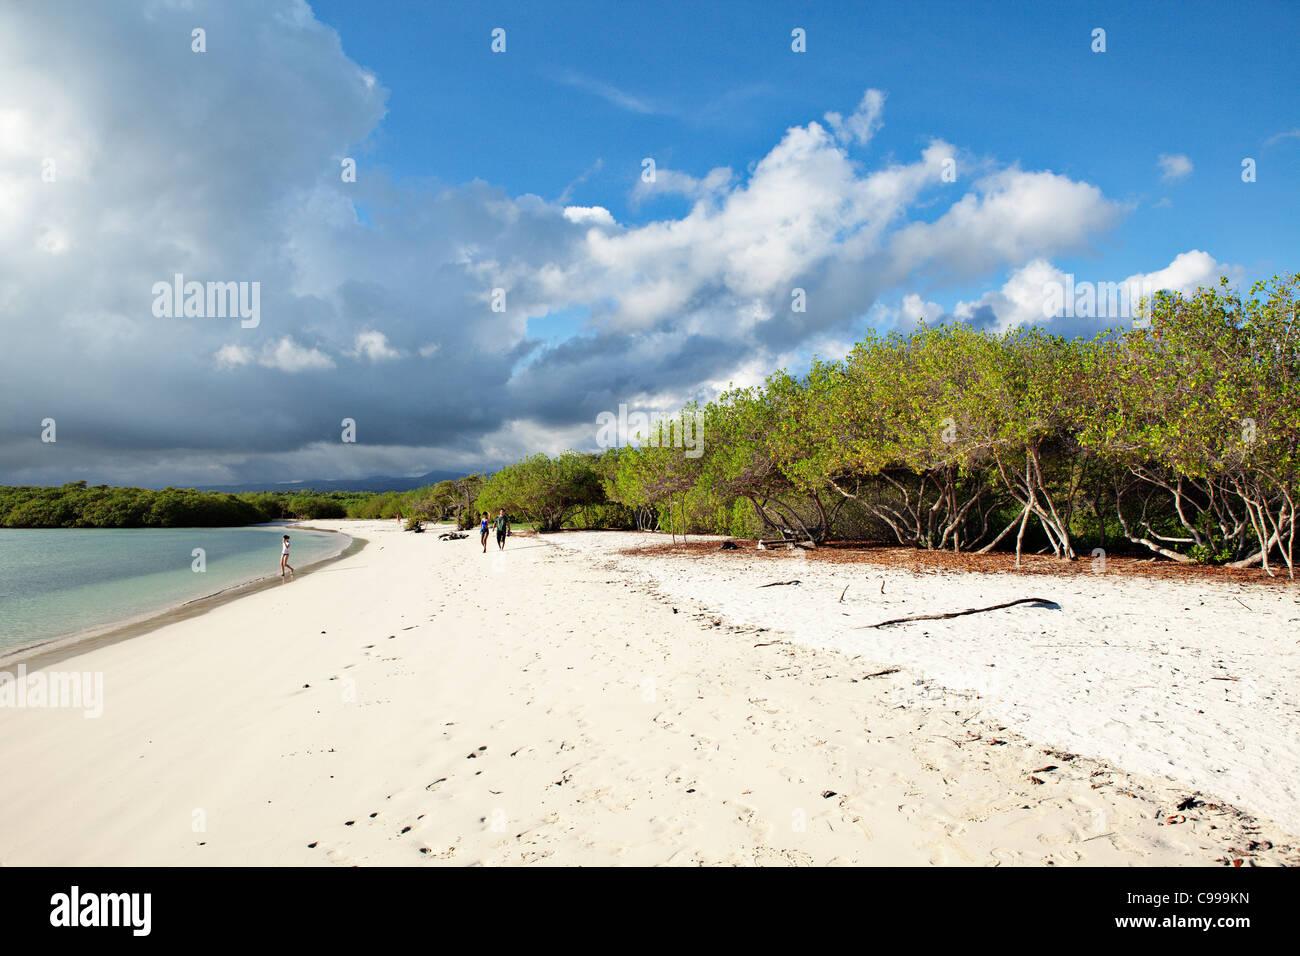 Tortuga Beach auf der Insel Santa Cruz, Galapagos, Ecuador. Stockbild